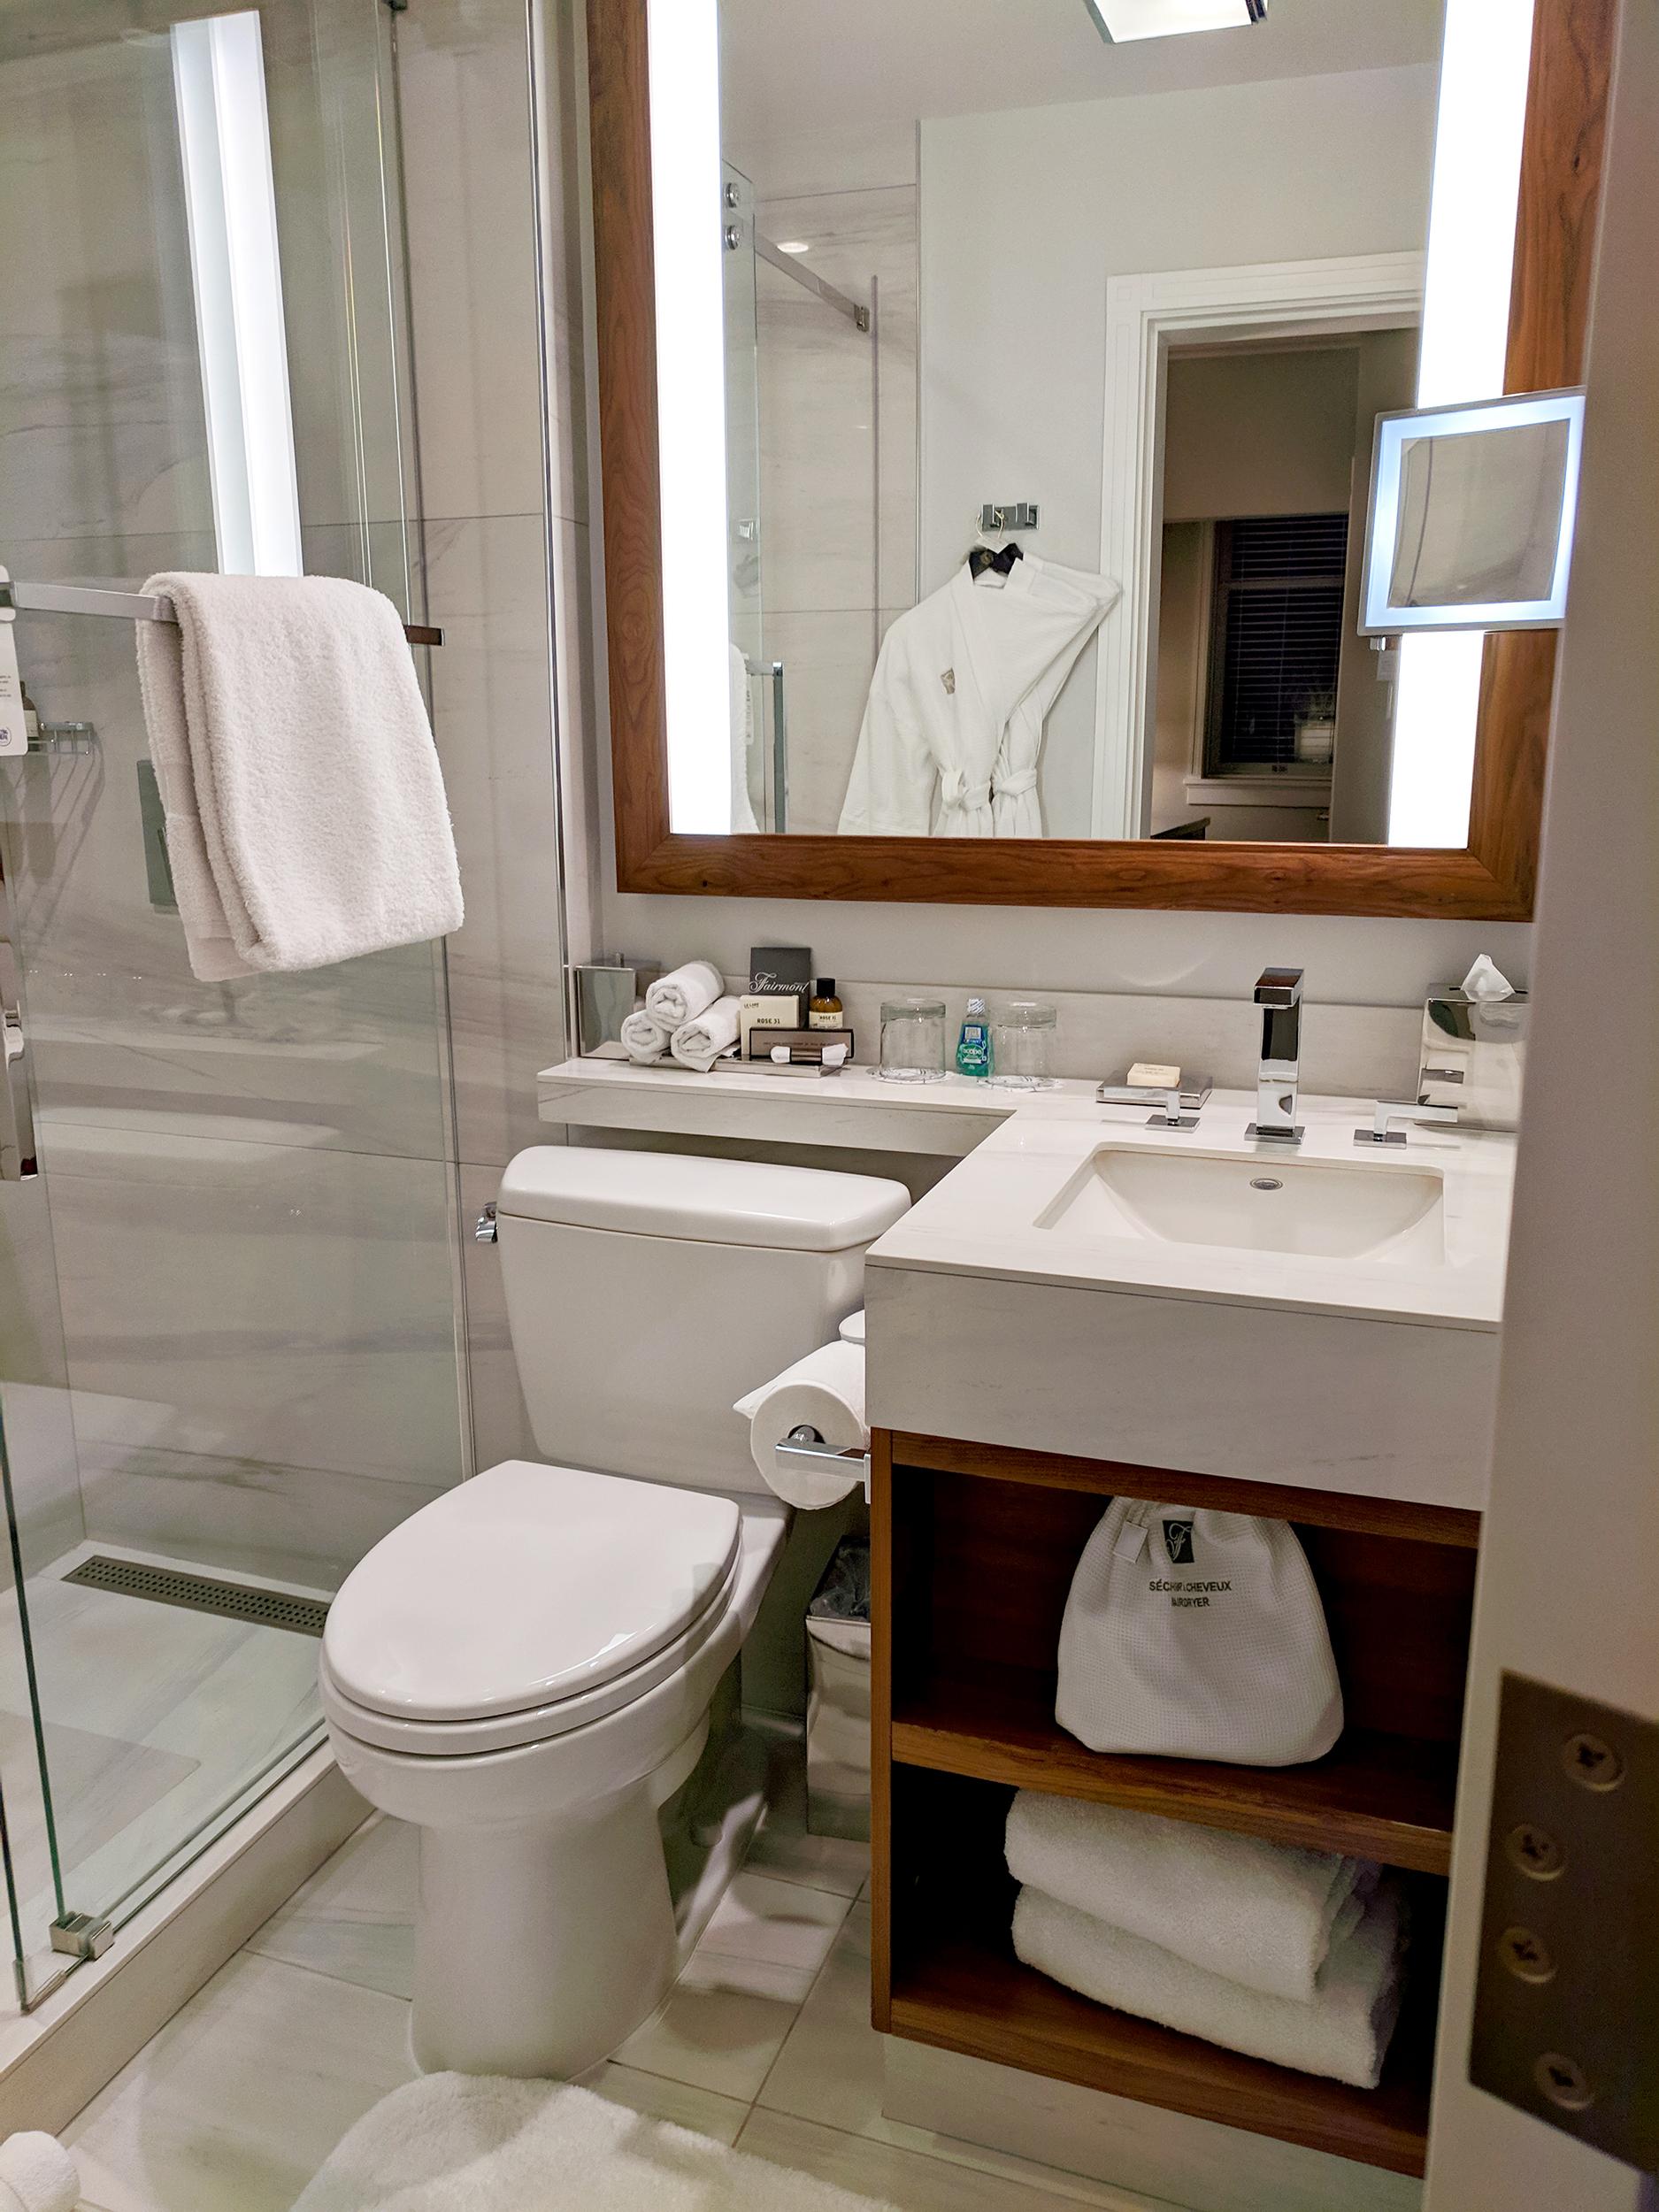 Fairmont Empress bathroom